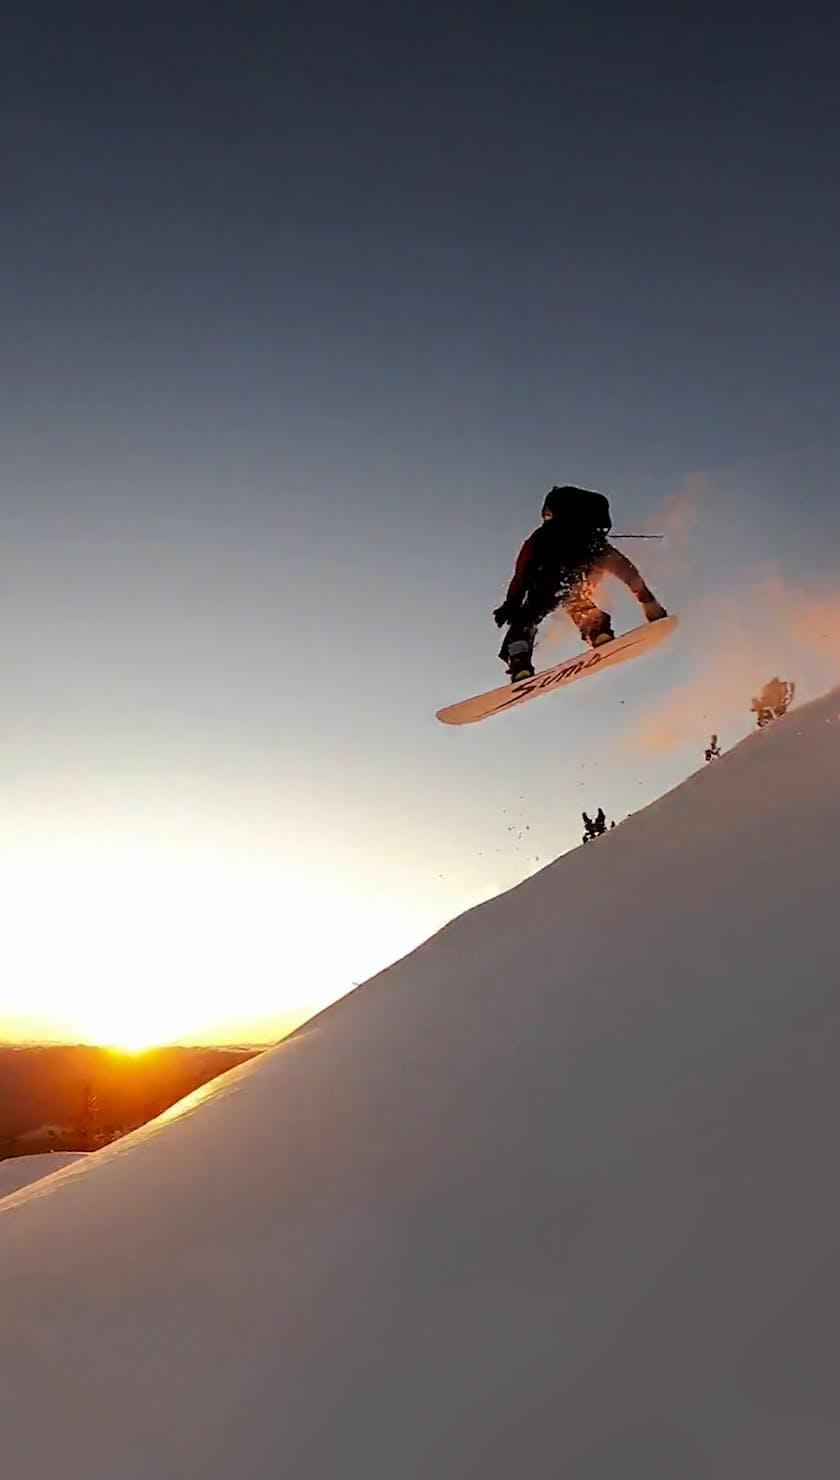 BD Athlete John Jackson sending a cliff